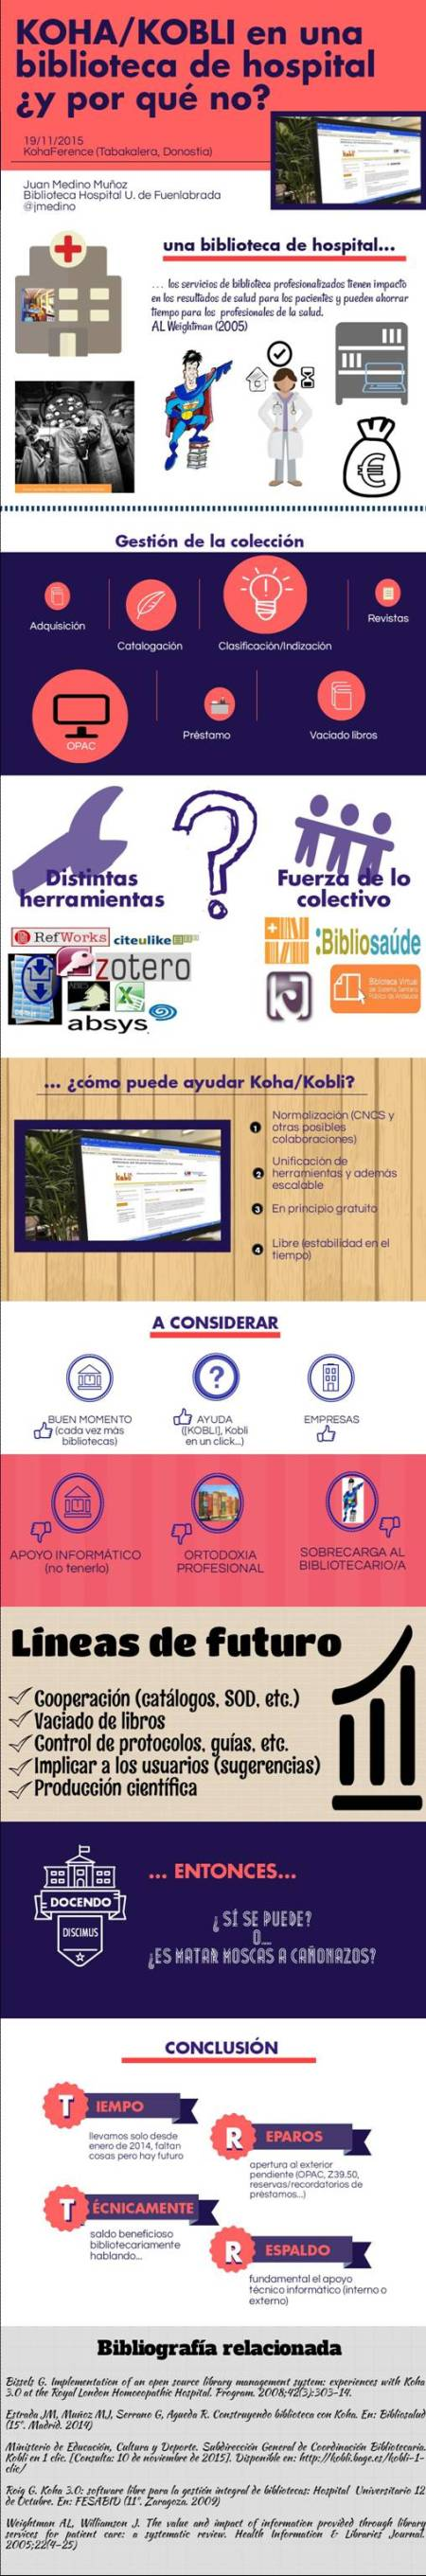 Kohaference (Donosti, 19 de noviembre de 2015)